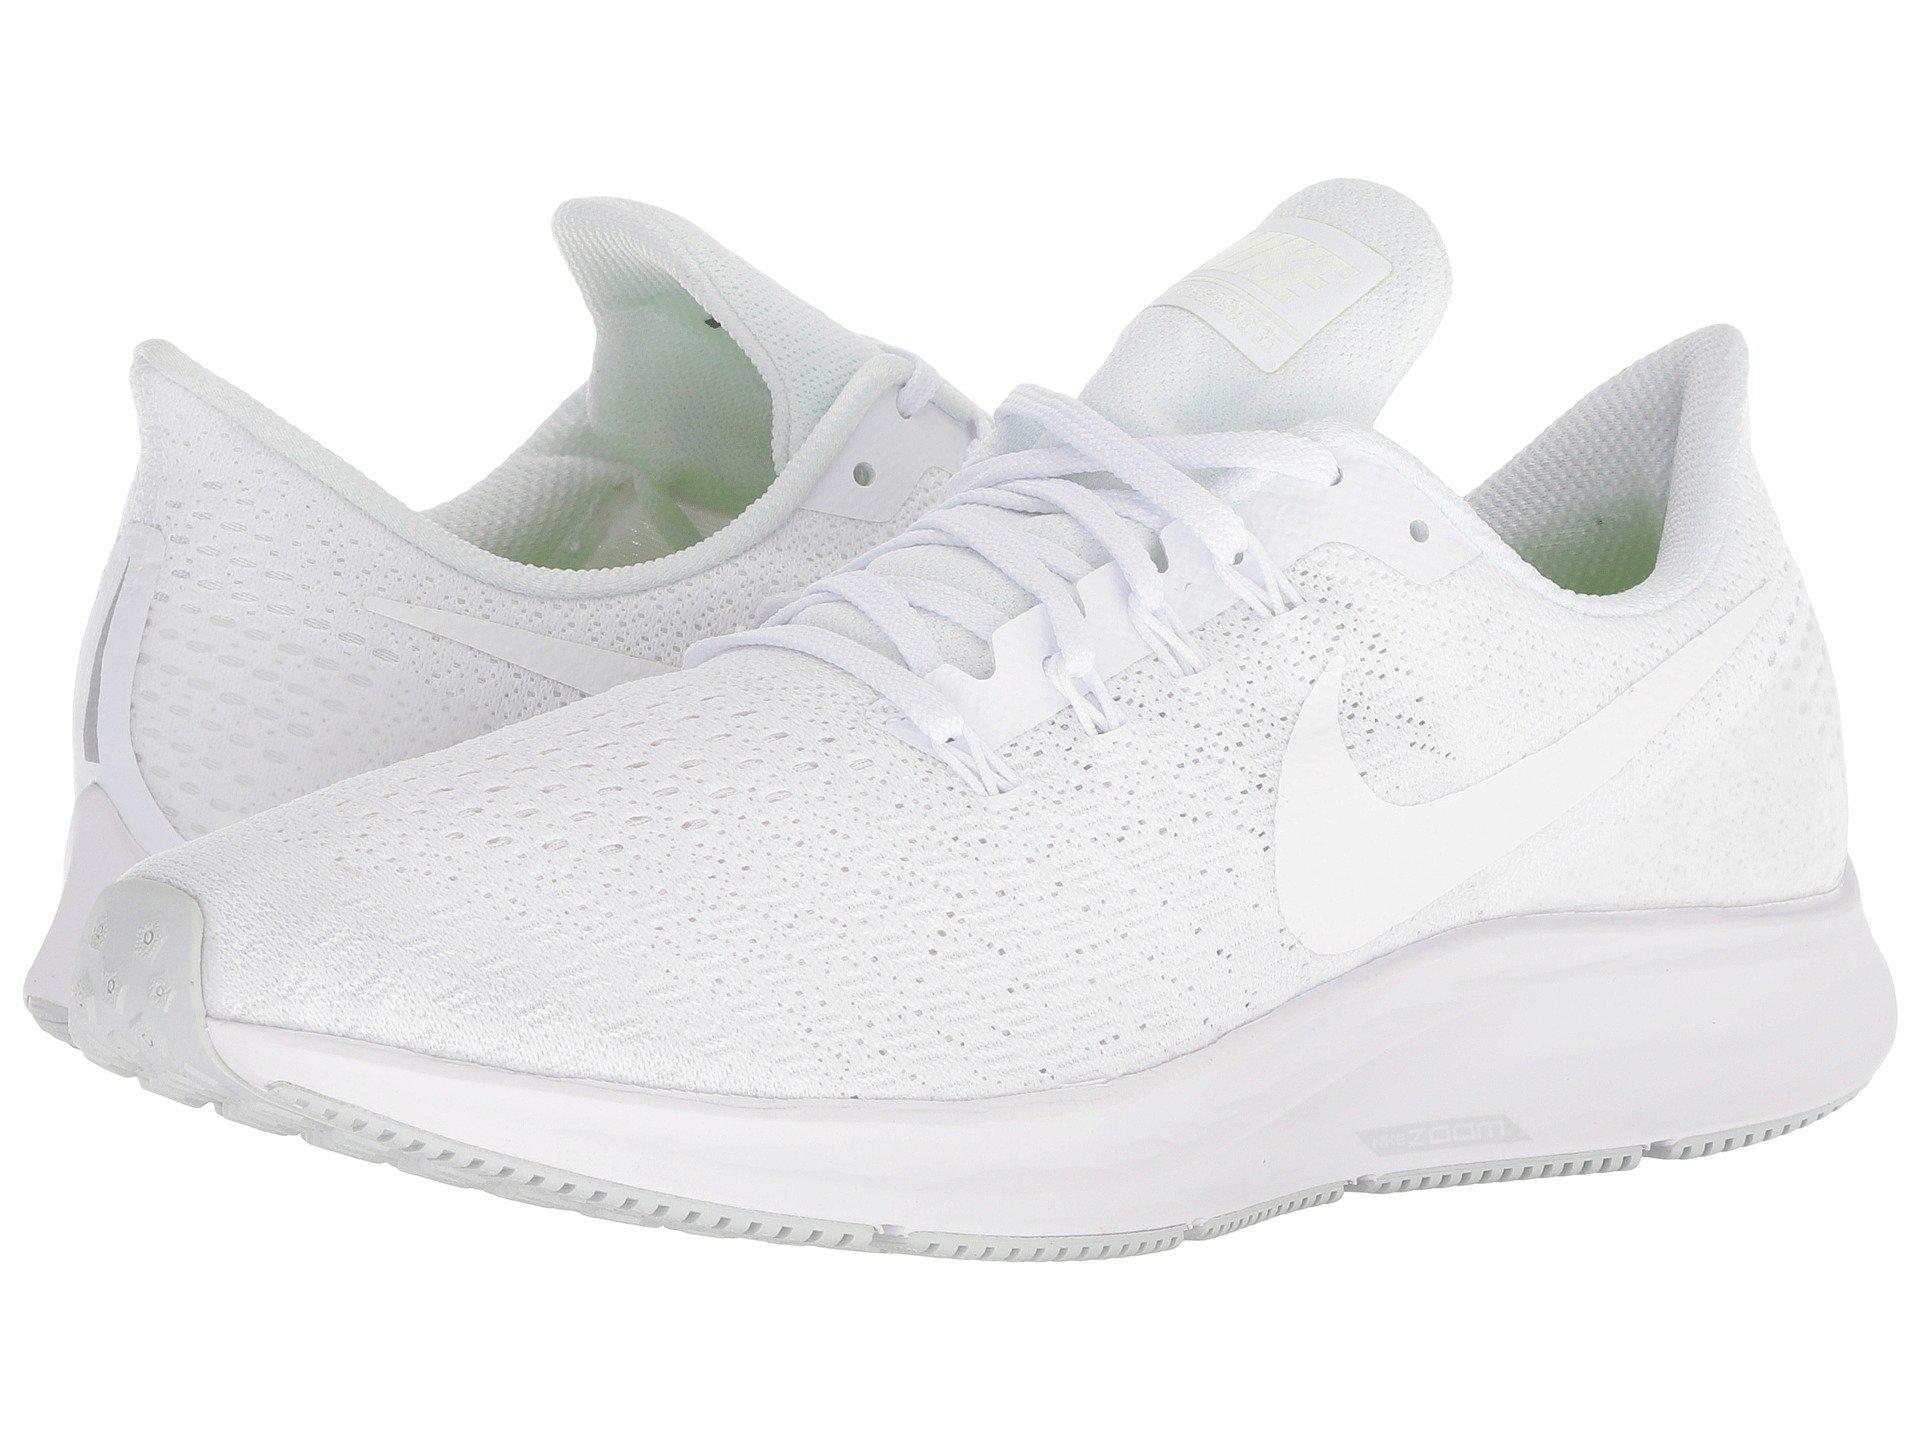 0eb9ed3e0659 Lyst - Nike Air Zoom Pegasus 35 in White for Men - Save 50.0%